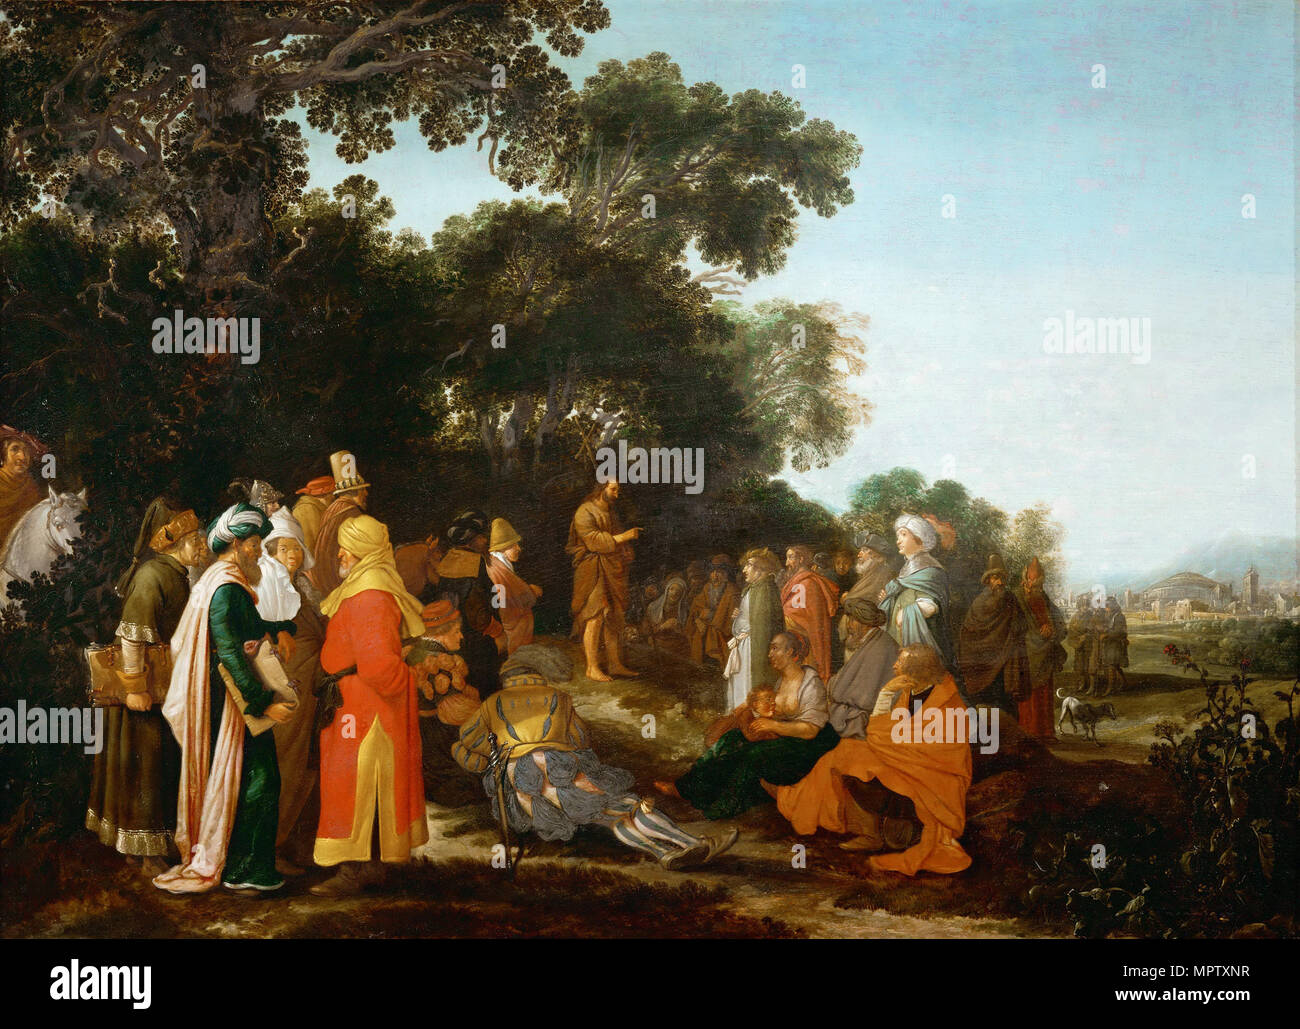 The Preaching of Saint John the Baptist. - Stock Image